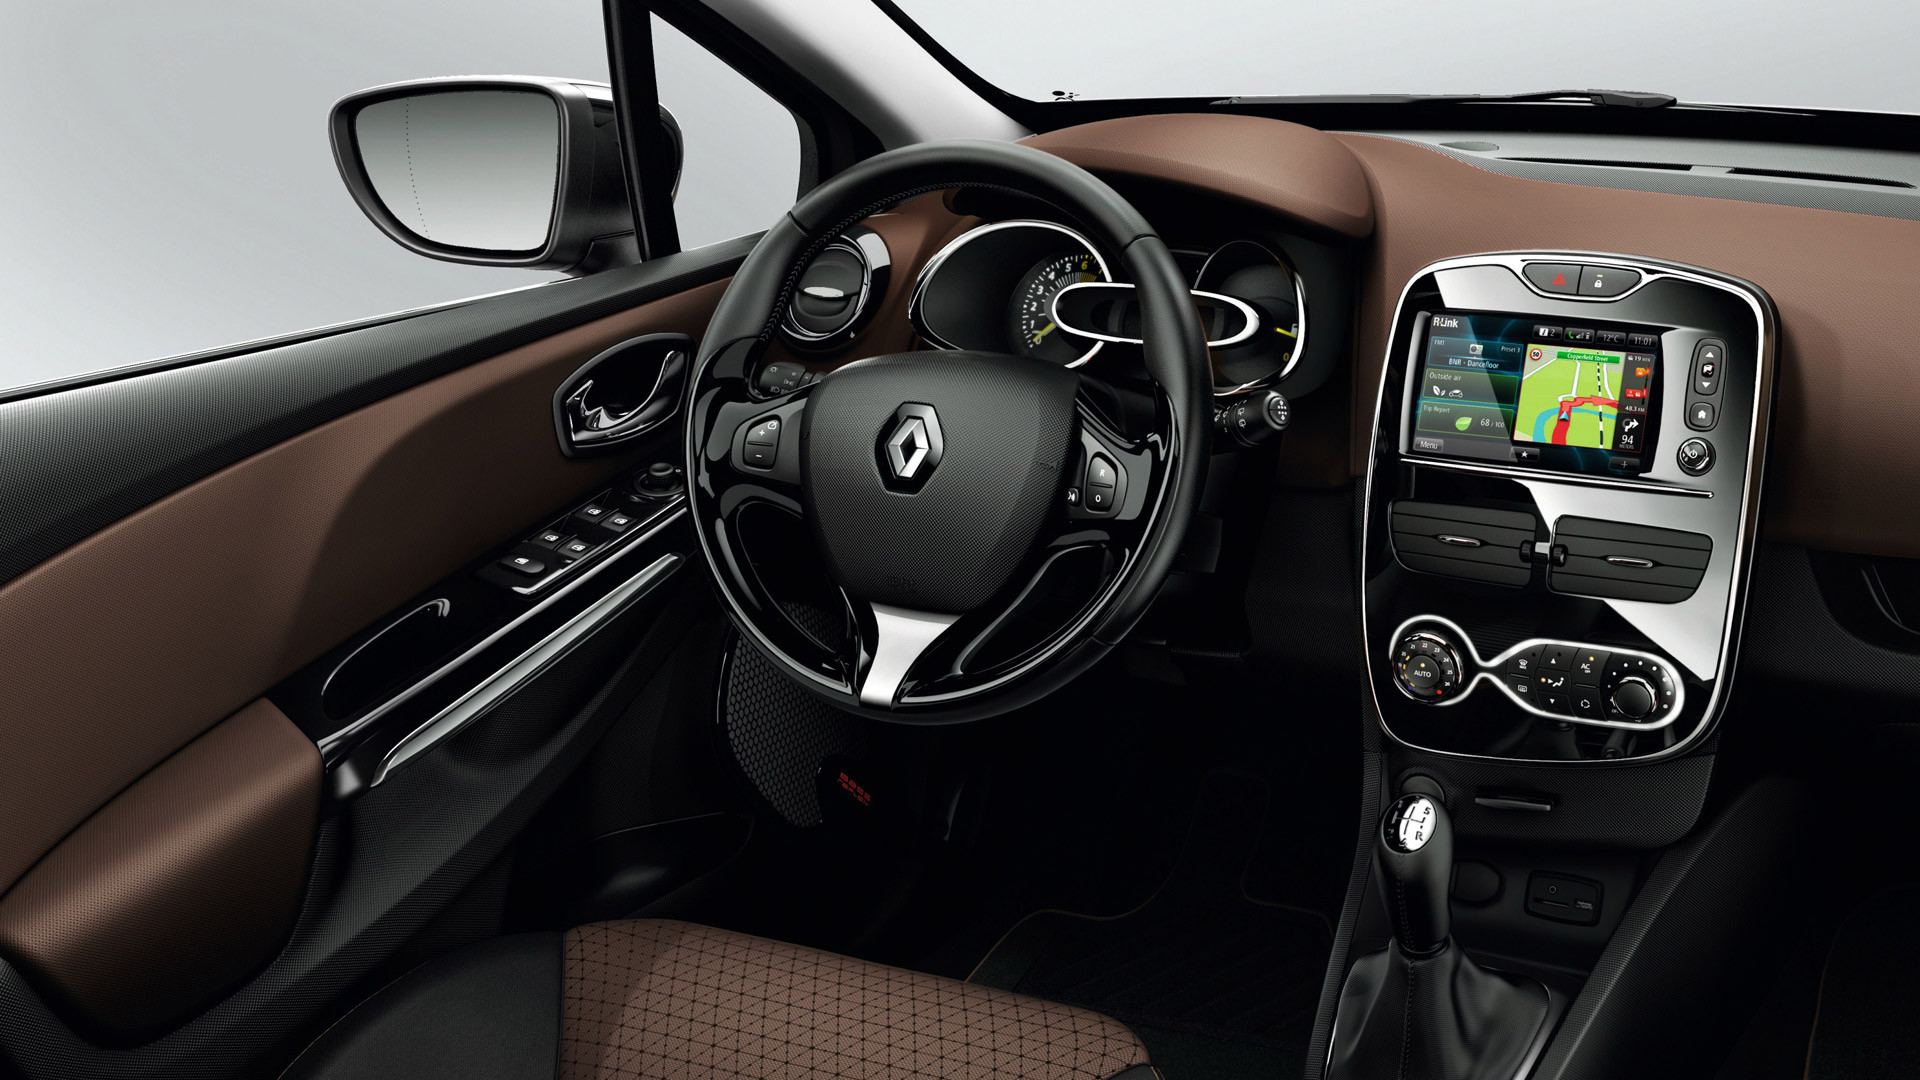 Garage renault nodari bagnols automobile neuve dacia for Garage renault abbeville occasion